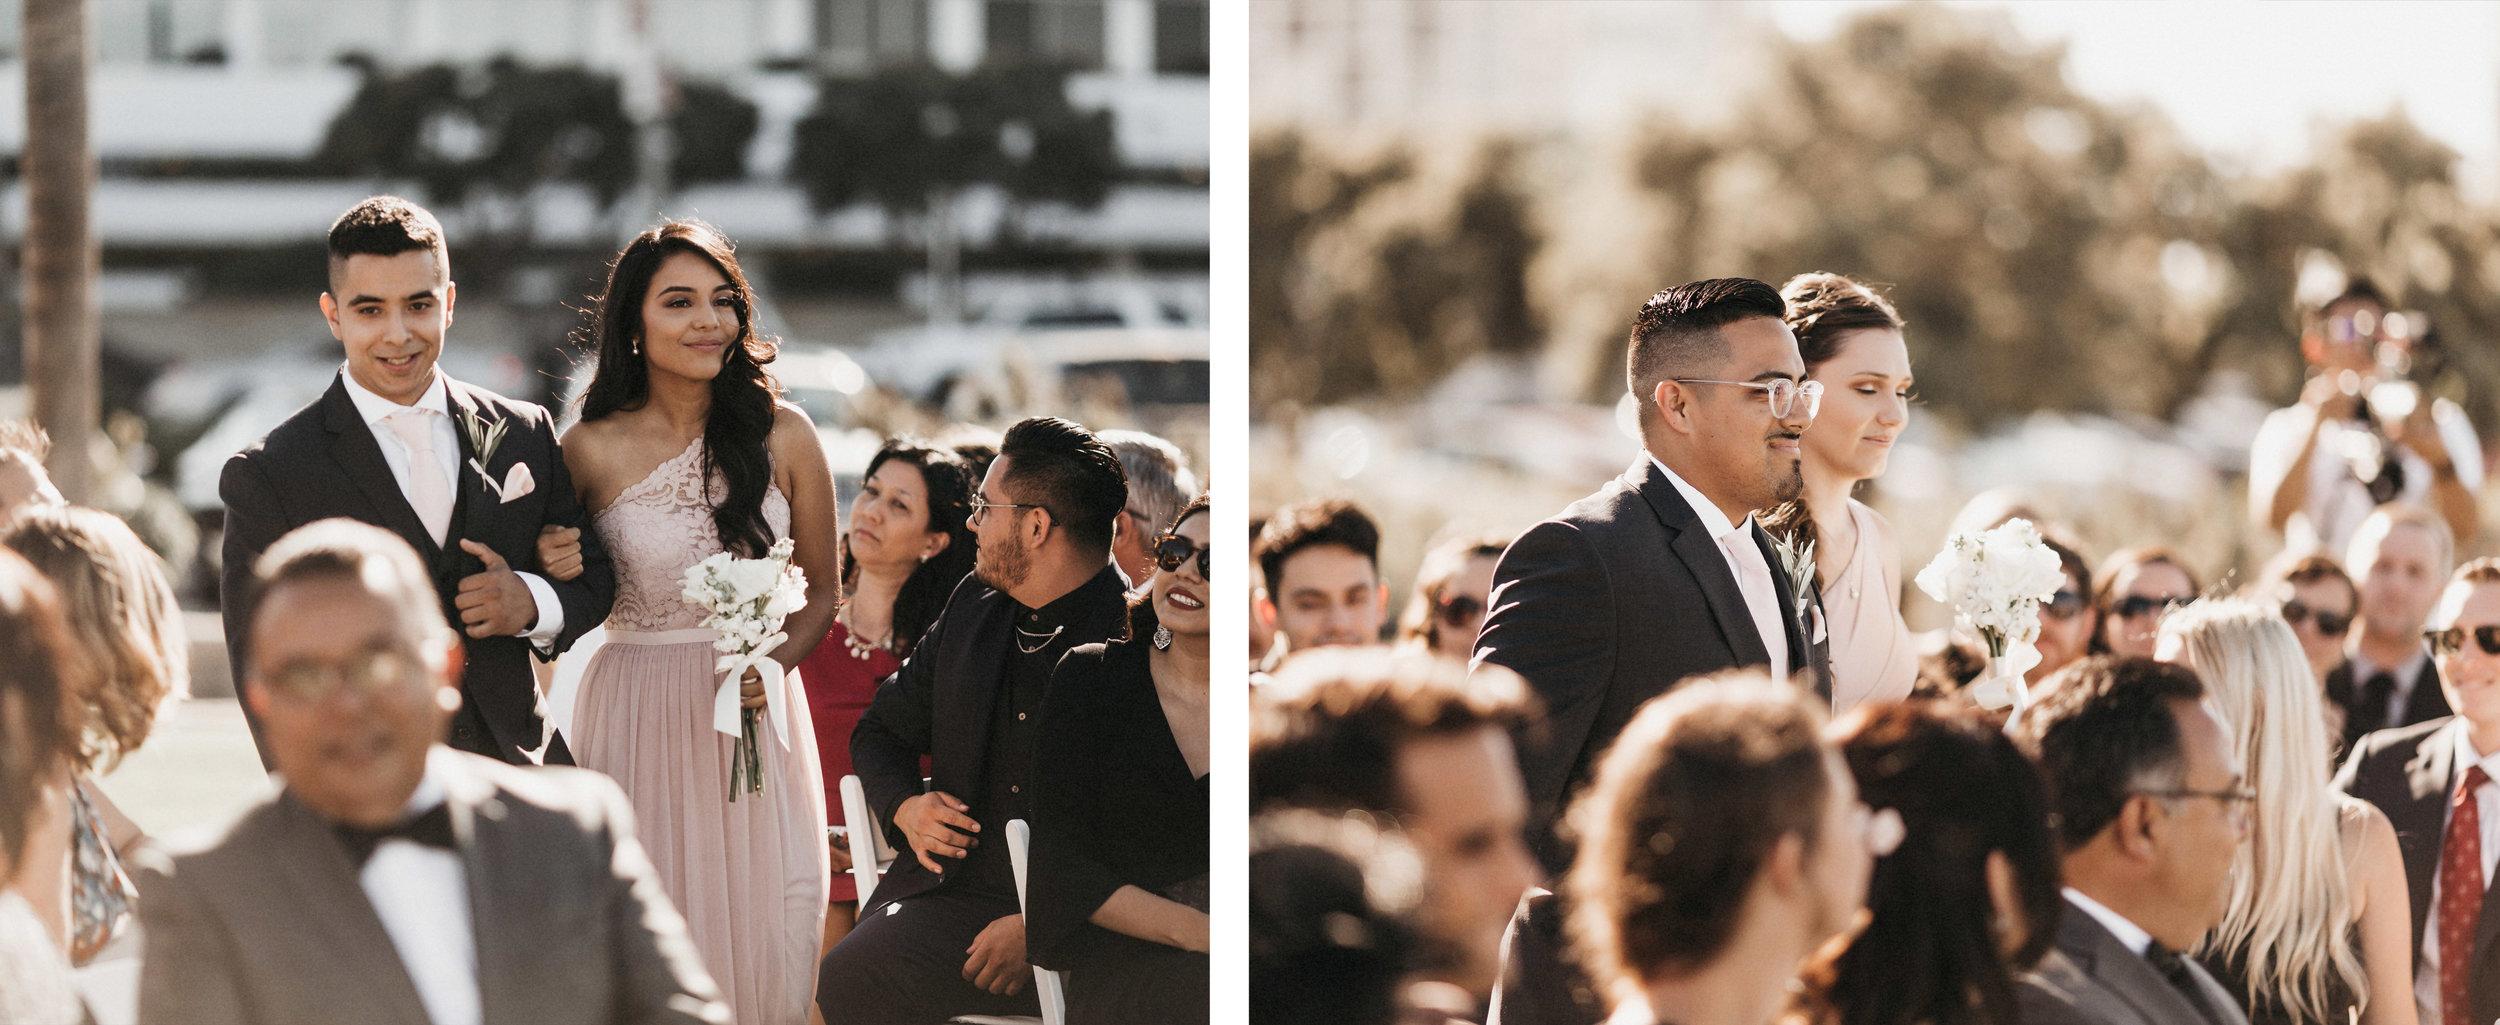 coronado wedding_7.jpg